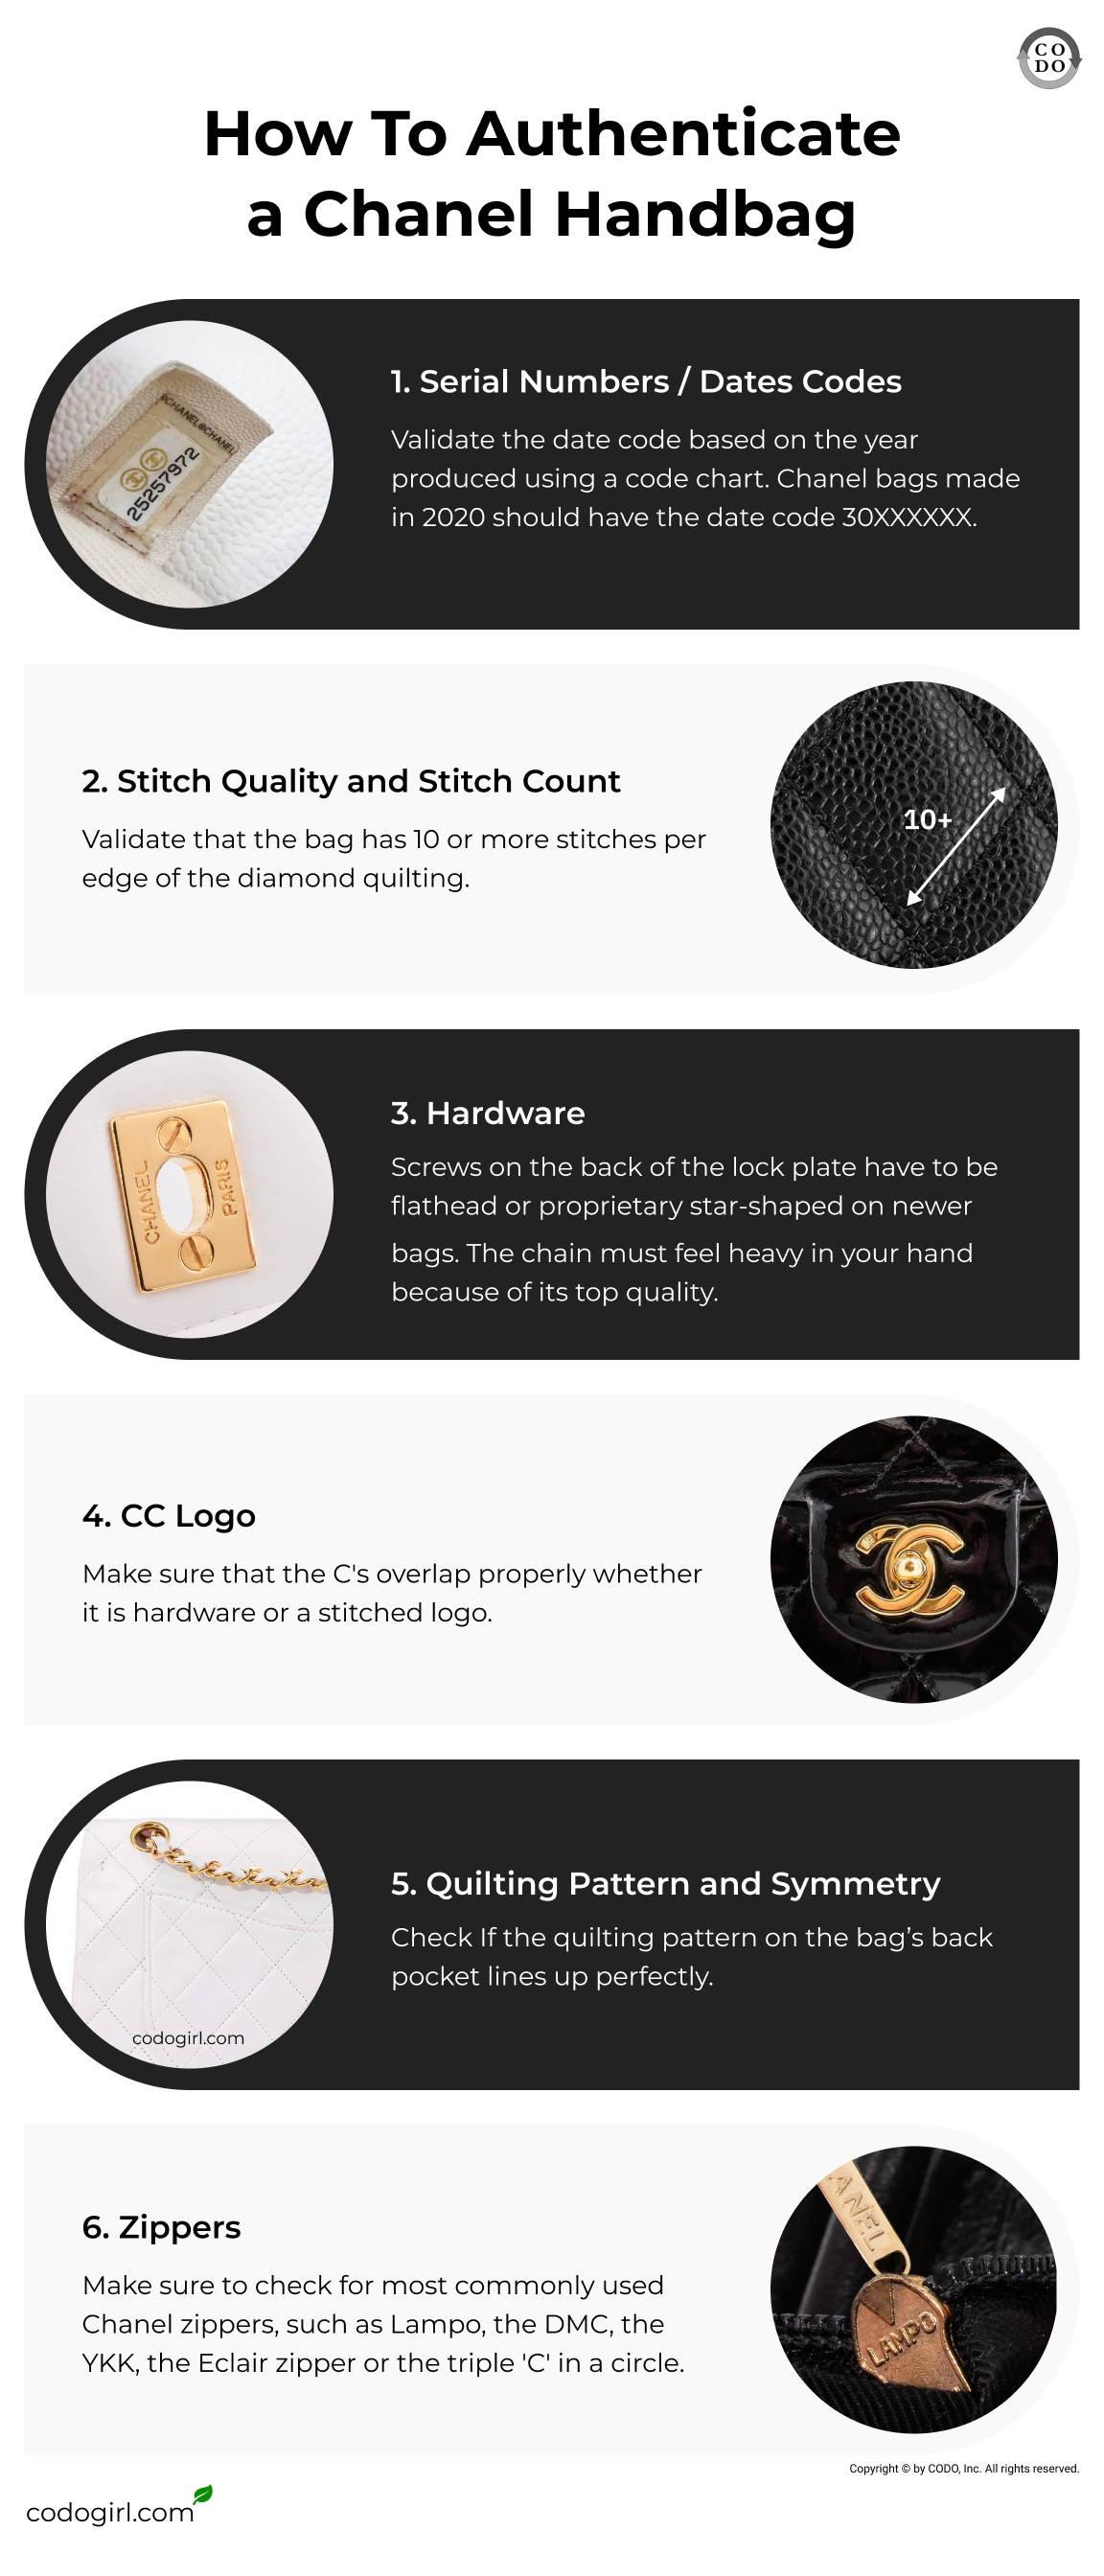 Steps to Chanel Handbag Authentication